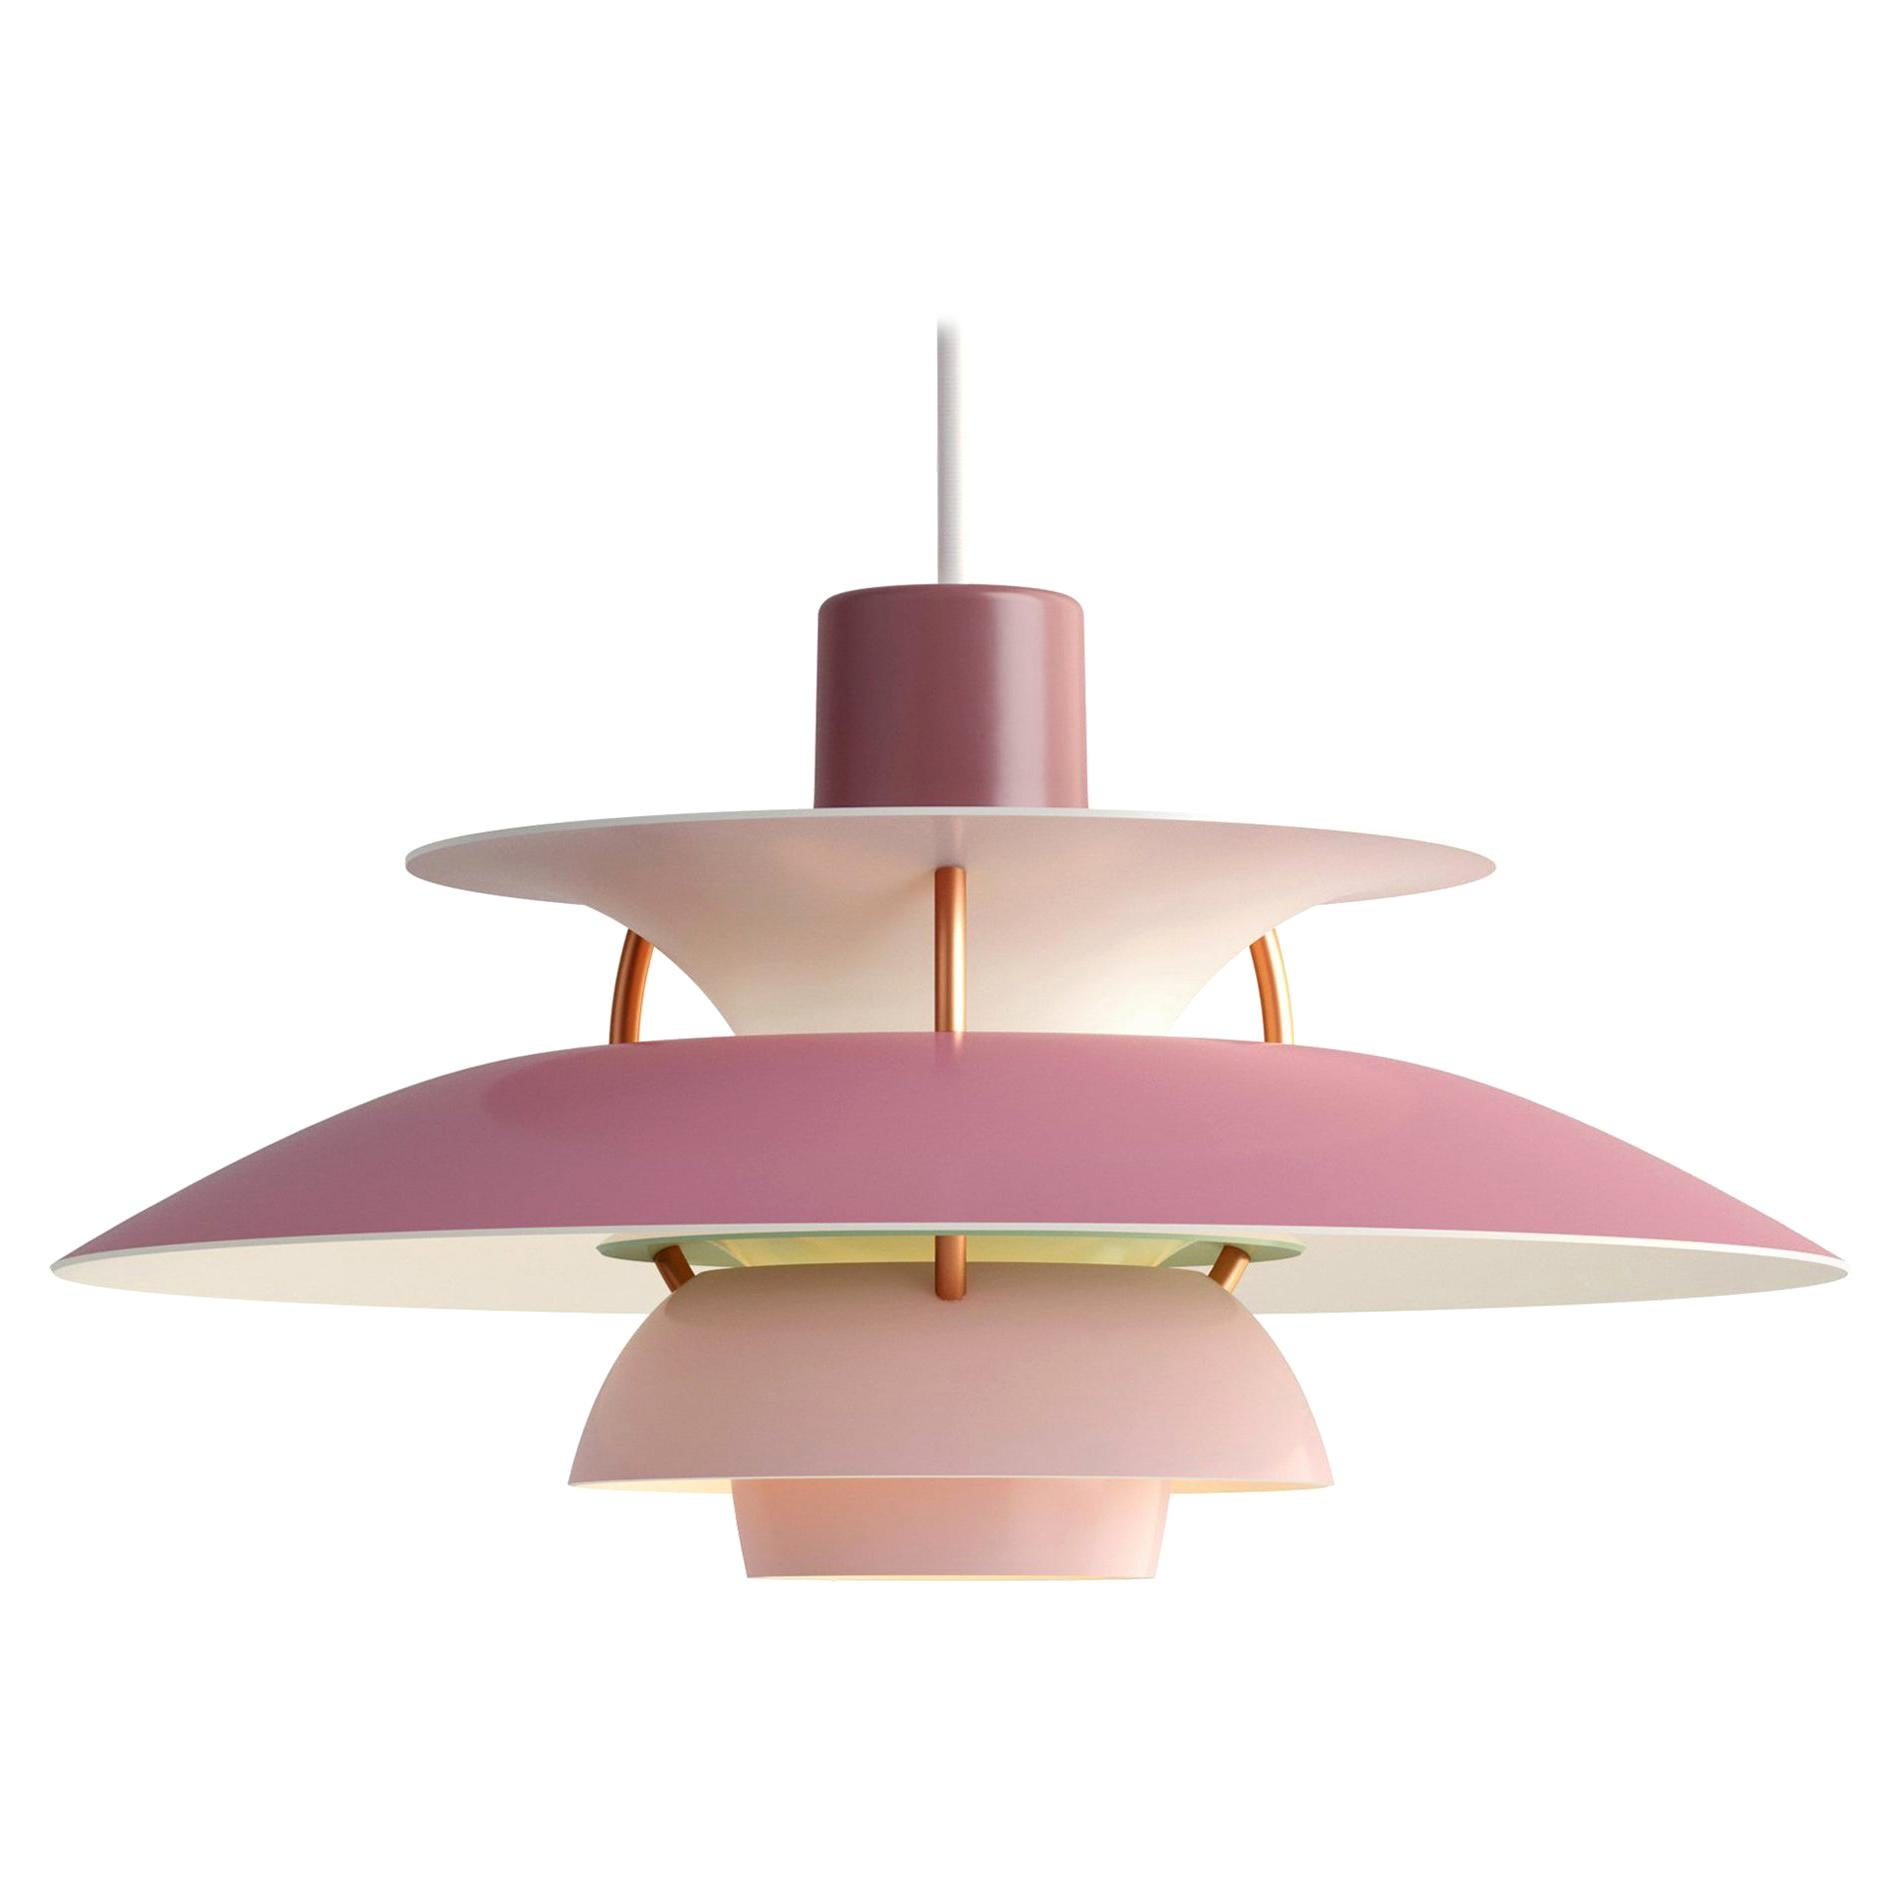 Poul Henningsen Rose PH5 Mini Pendants for Louis Poulsen